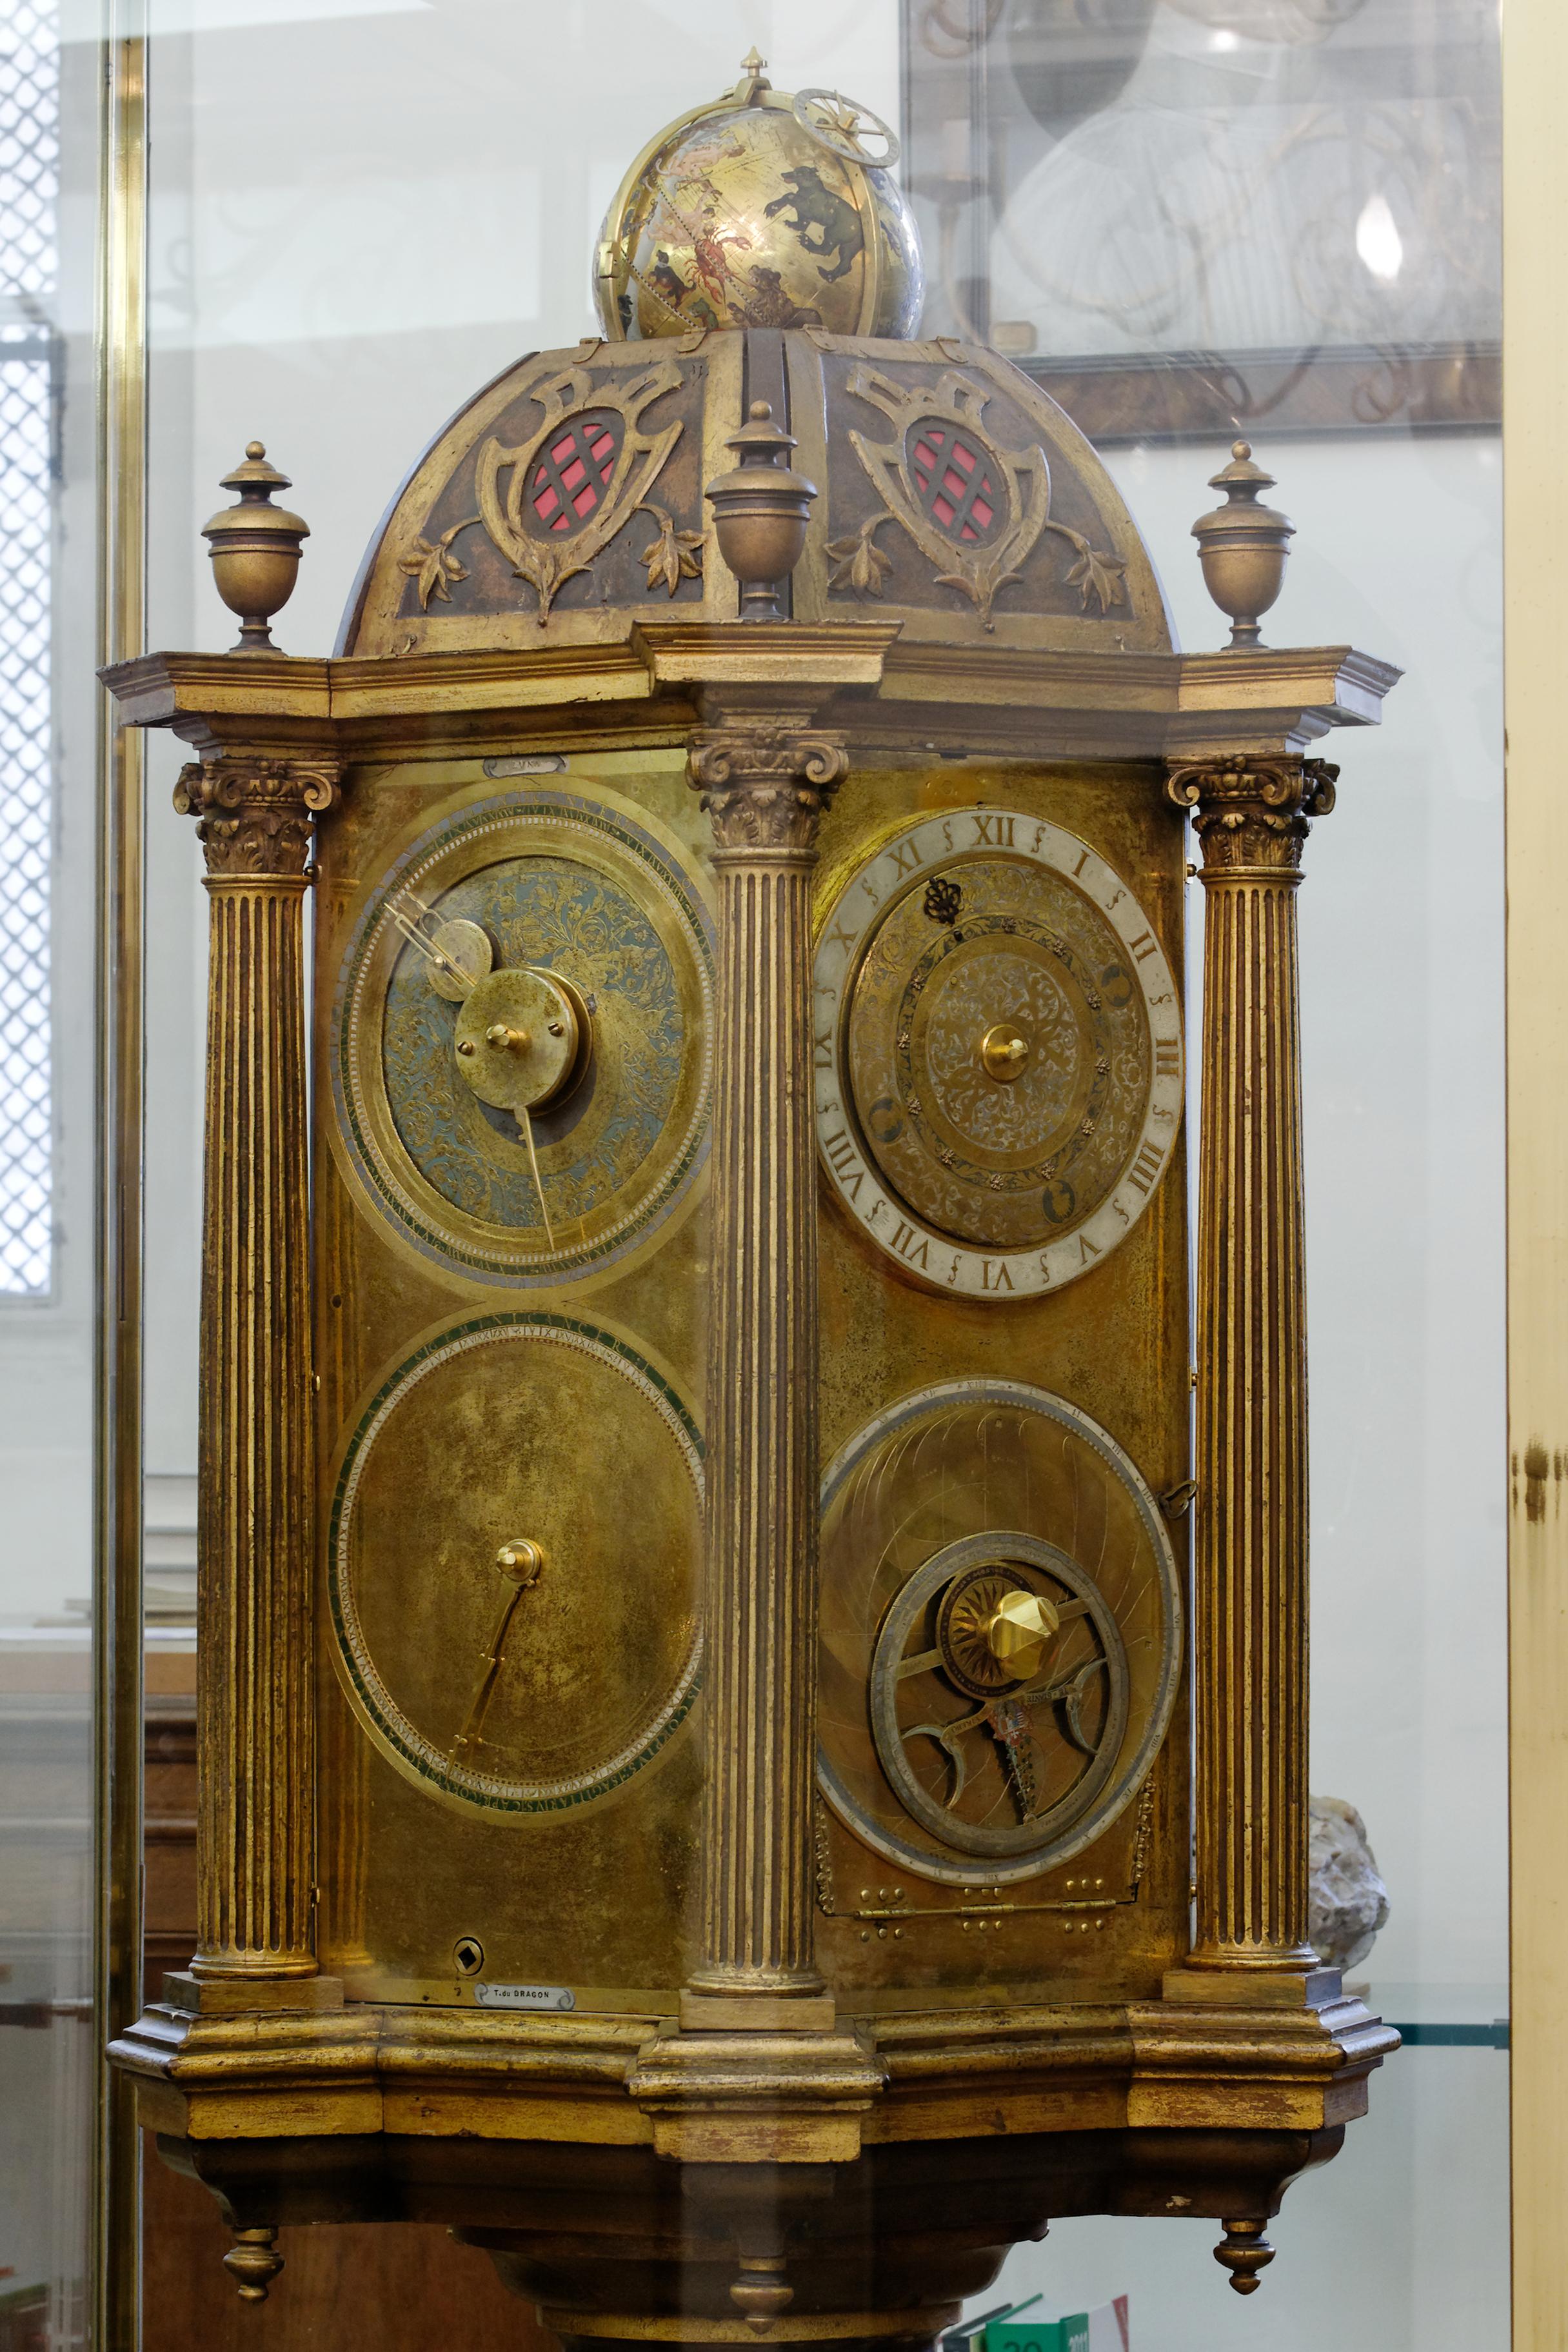 Horloge De Bureau Originale fichier:horloge astronomique bibliotheque sainte-genevieve